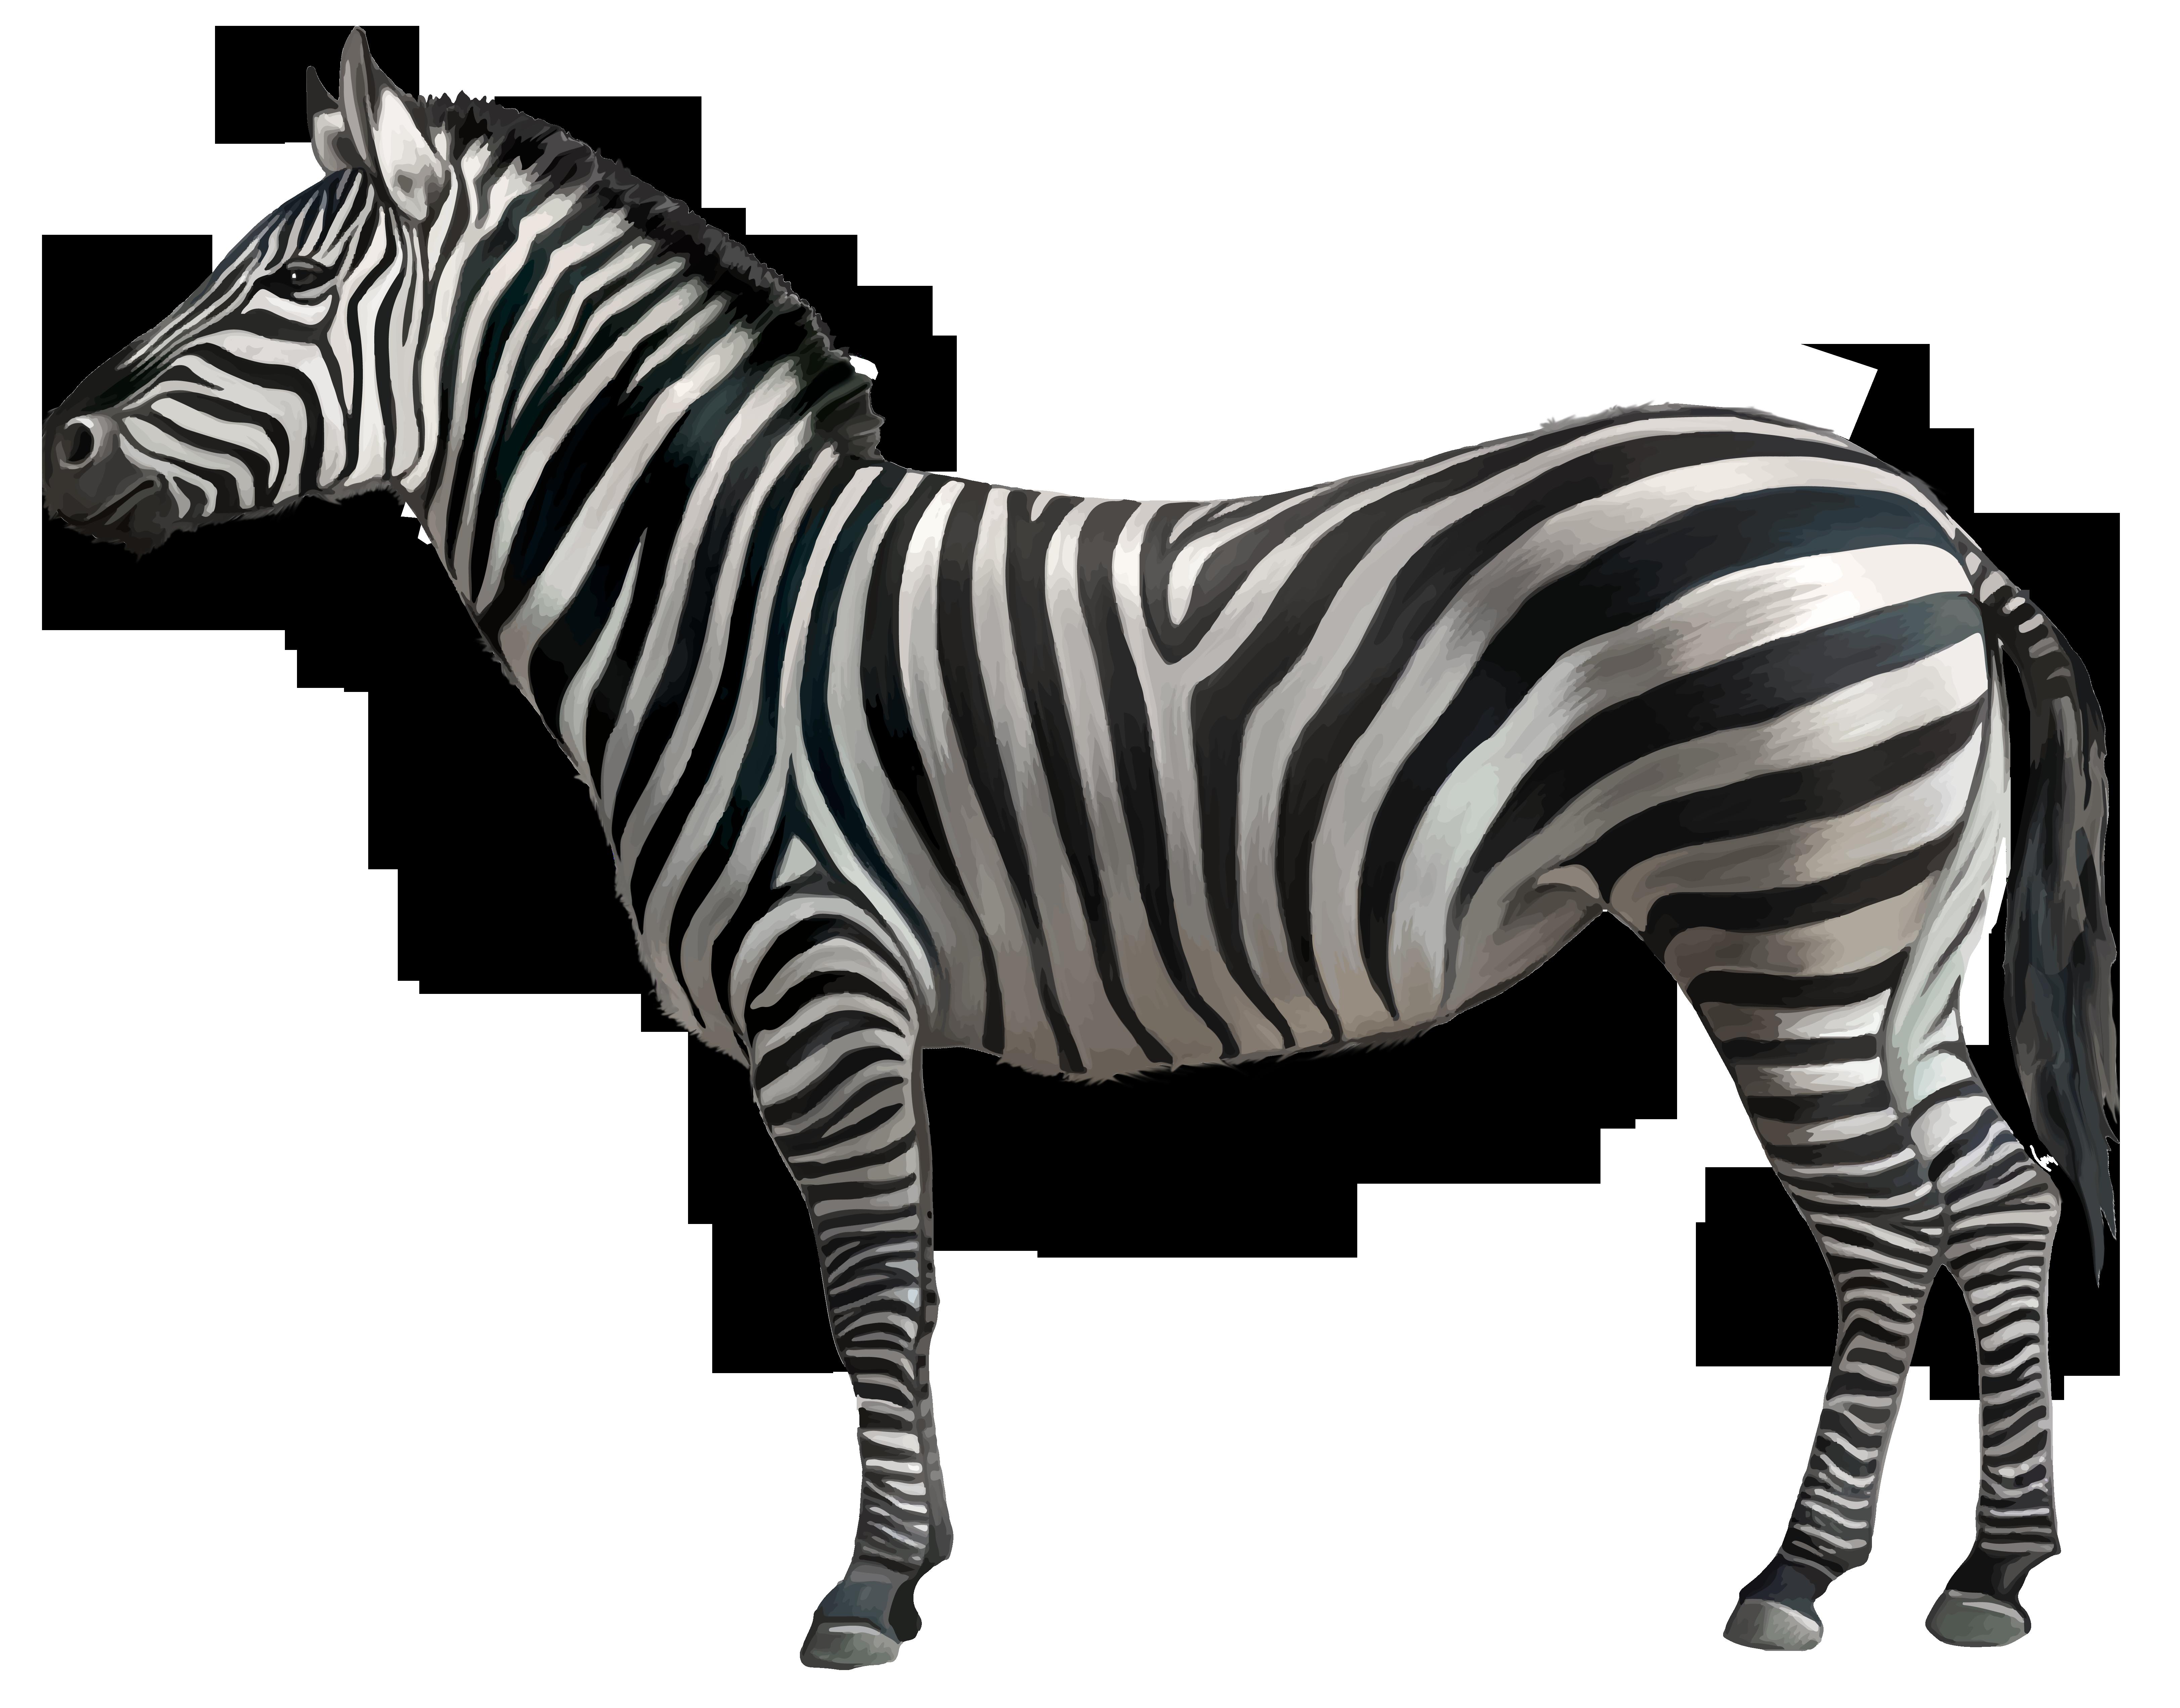 Zebra star clipart clip art transparent download Zebra PNG Clipart Image   Gallery Yopriceville - High-Quality ... clip art transparent download